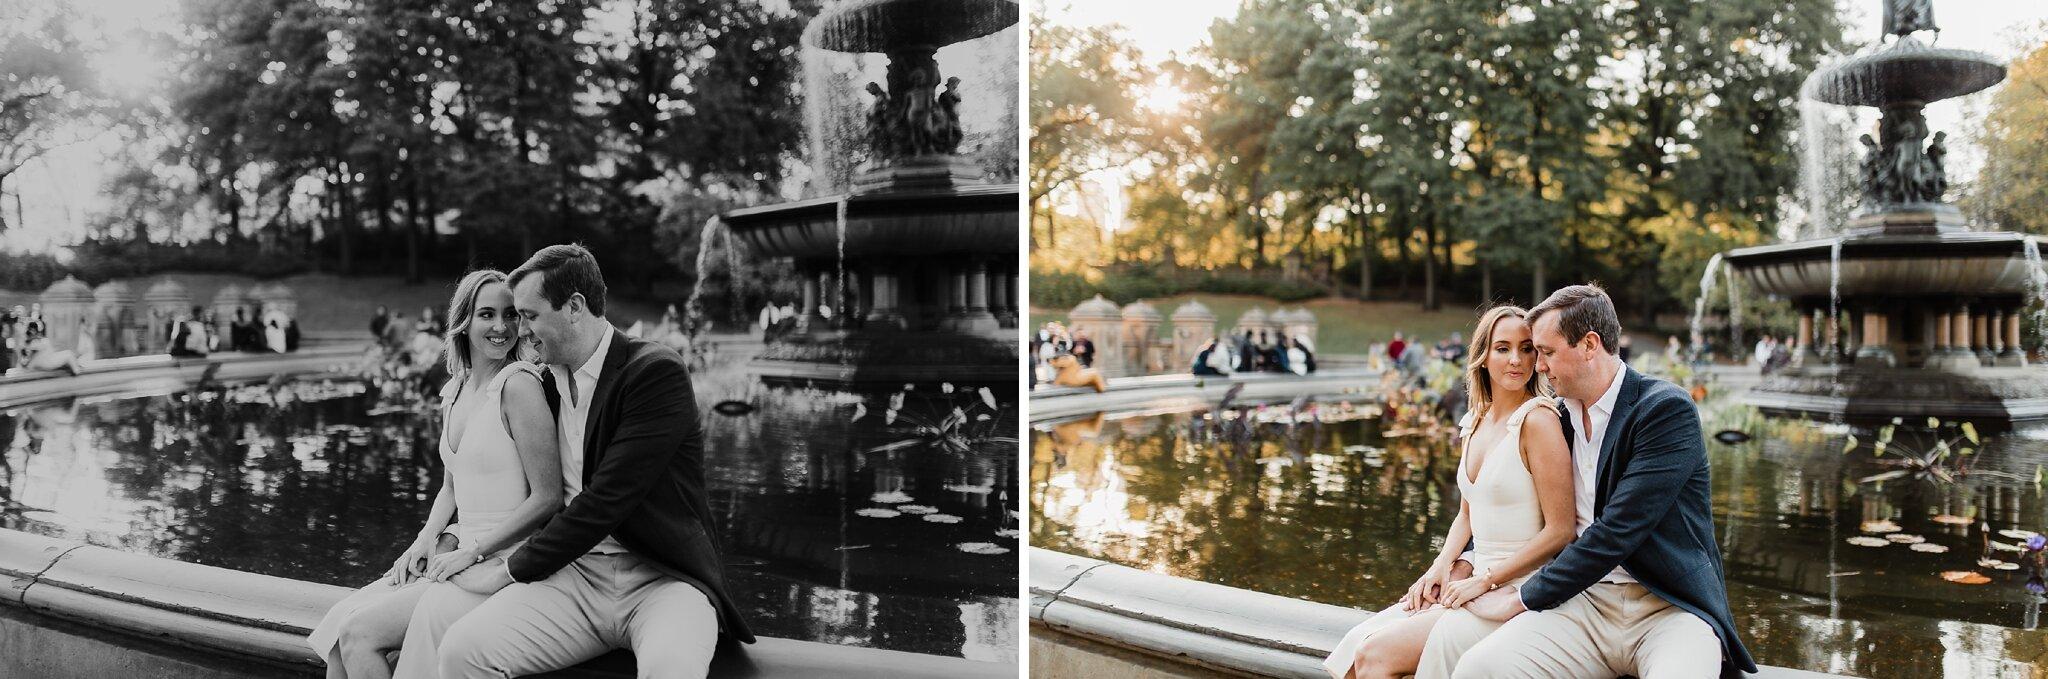 Alicia+lucia+photography+-+albuquerque+wedding+photographer+-+santa+fe+wedding+photography+-+new+mexico+wedding+photographer+-+new+mexico+wedding+-+engagement+-+new+york+engagement+-+new+york+city+engagement+-+central+park+engagement_0002.jpg